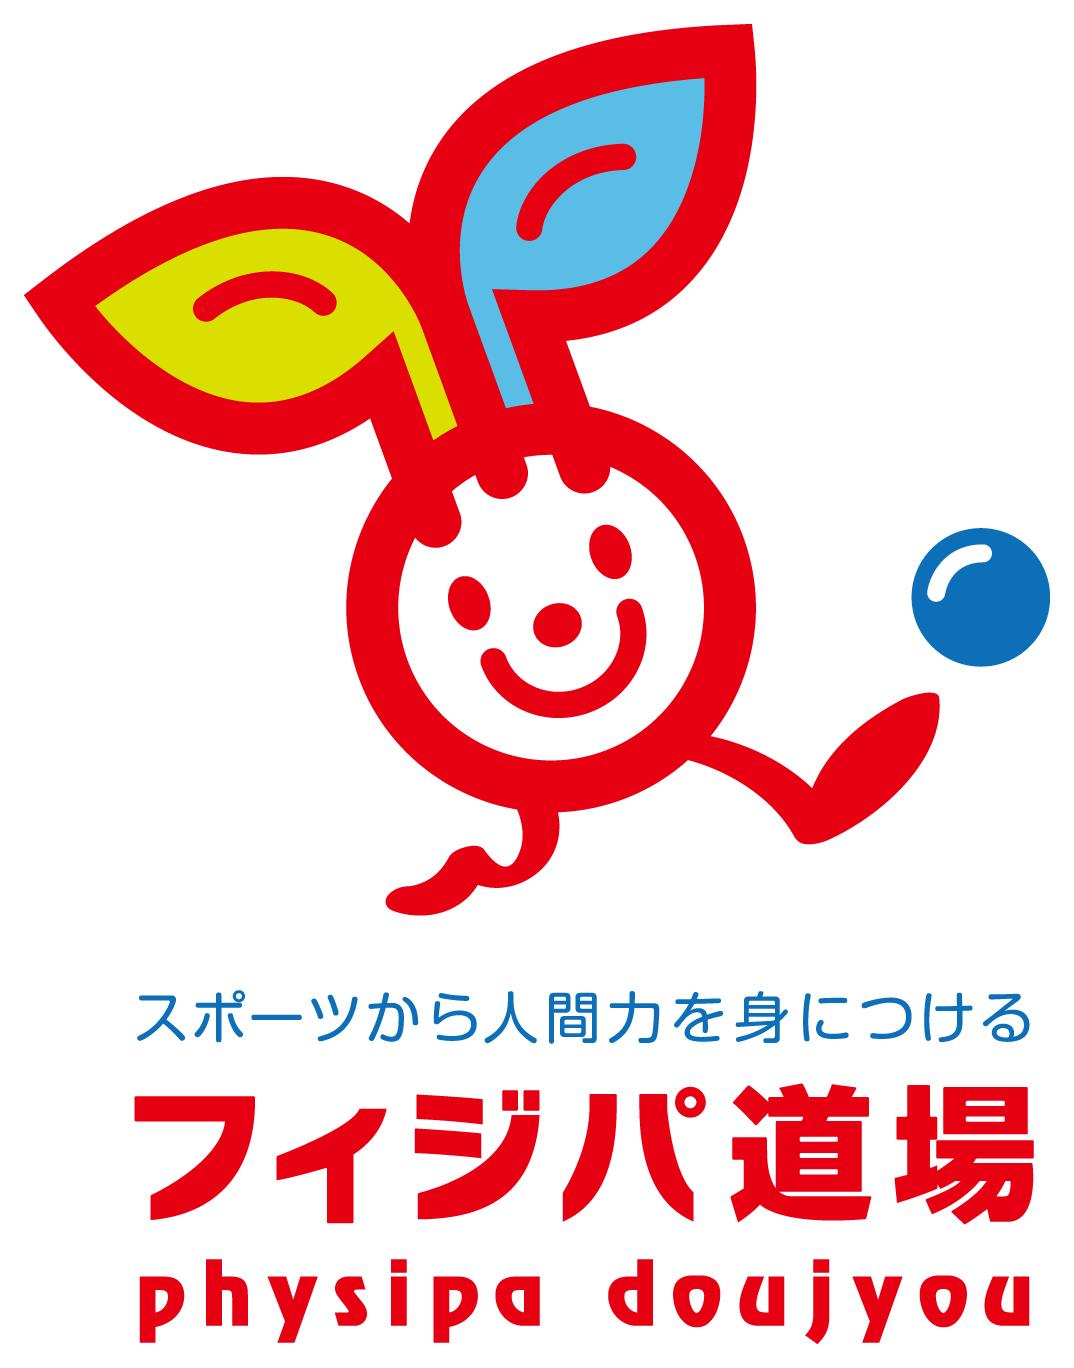 physipa-doujyou_logo_tate.jpg